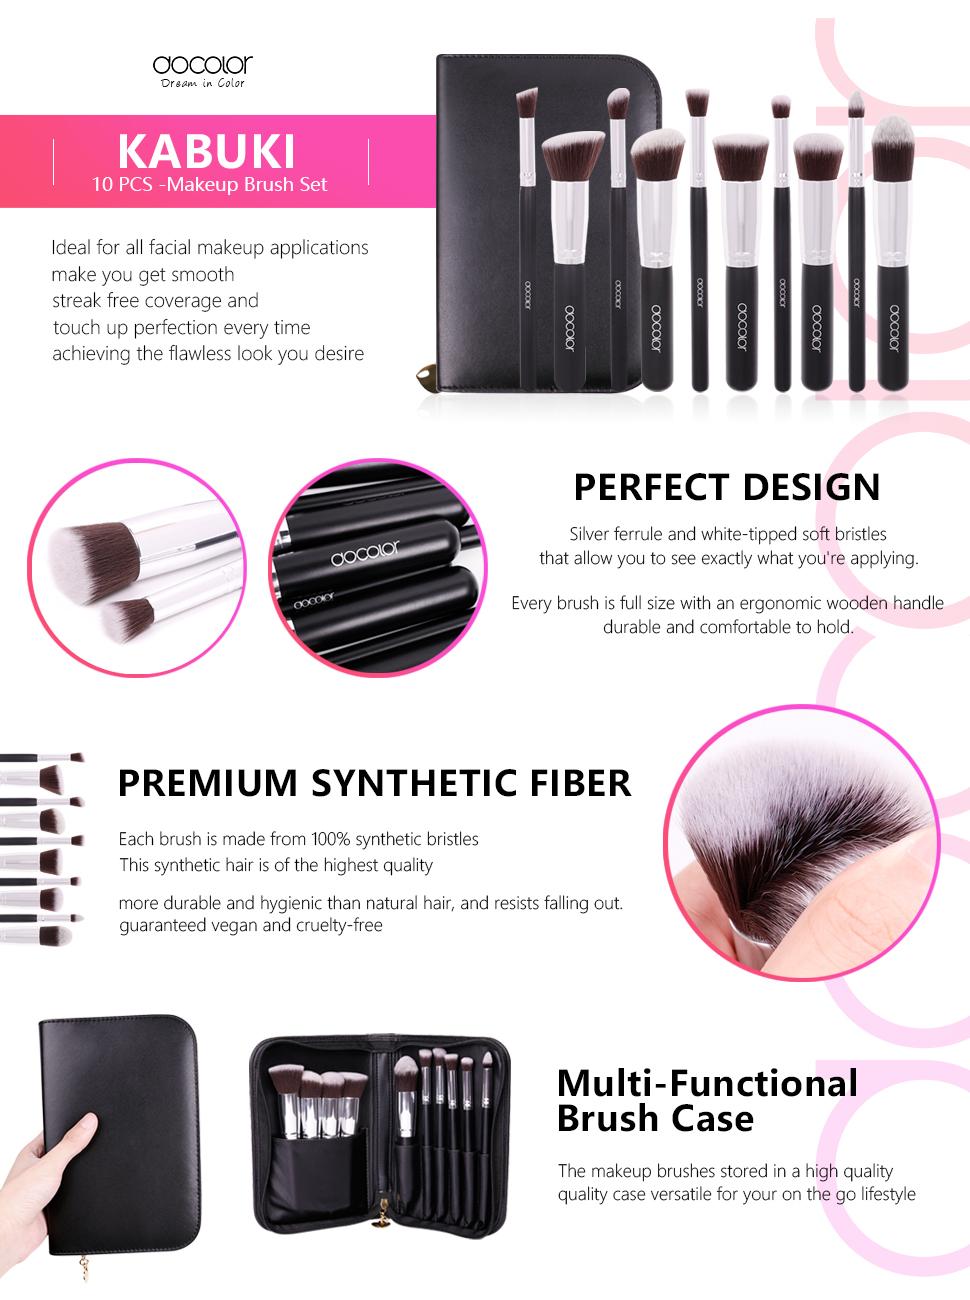 Kabuki Makeup Brush Travelling Set  5pcs Soft Nylon Hair Com Docolor 10pieces Synthetic Wooden Handle Professional Aliexpress 10pcs Brushes Superior Mini Cosmetics